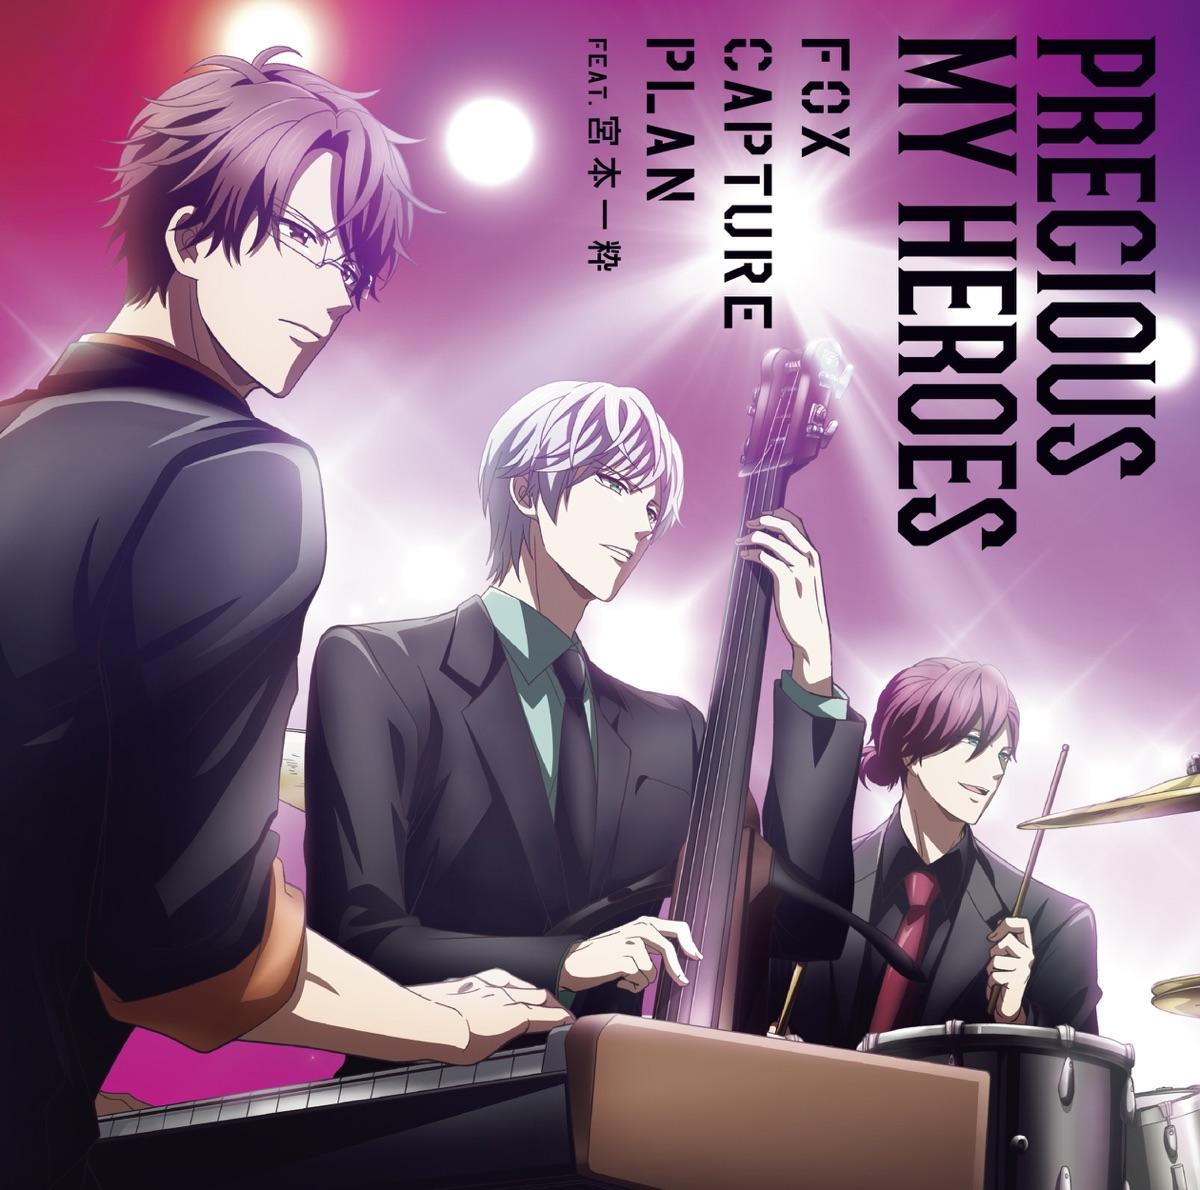 『fox capture plan feat.宮本一粋 - Precious My Heroes 歌詞』収録の『Precious My Heroes』ジャケット